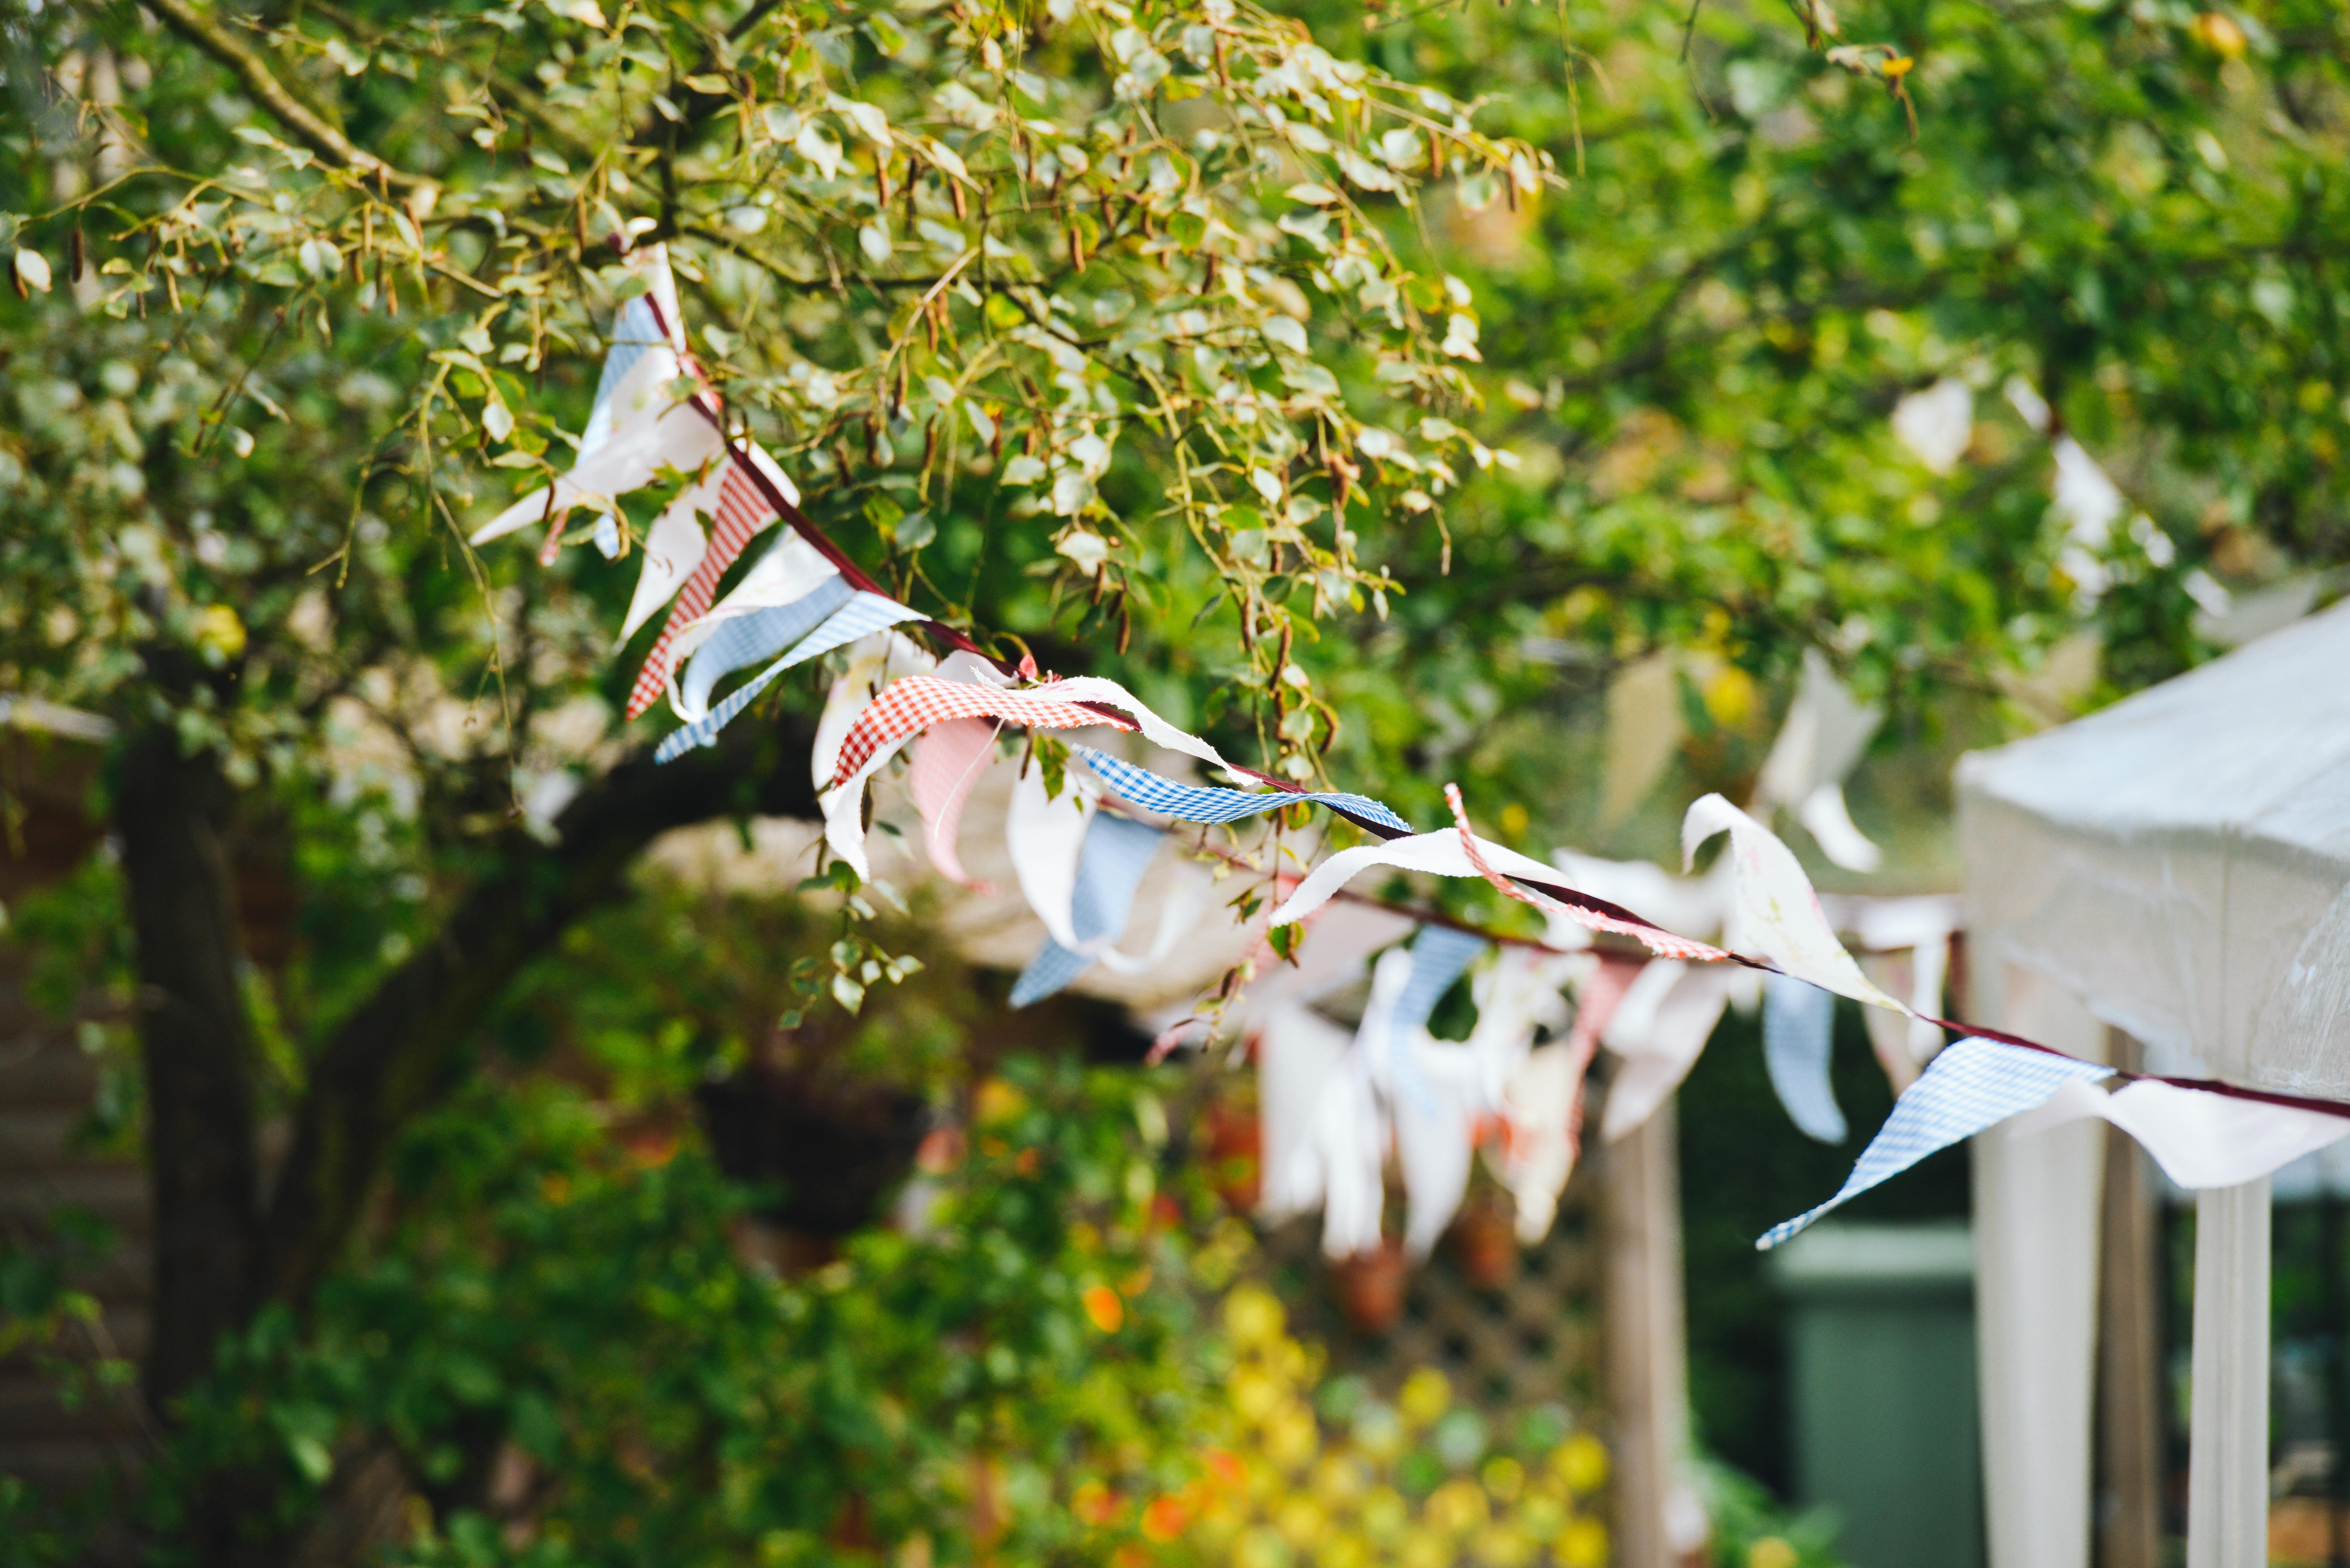 Free Images : nature, branch, blossom, plant, leaf, flower, wind ...